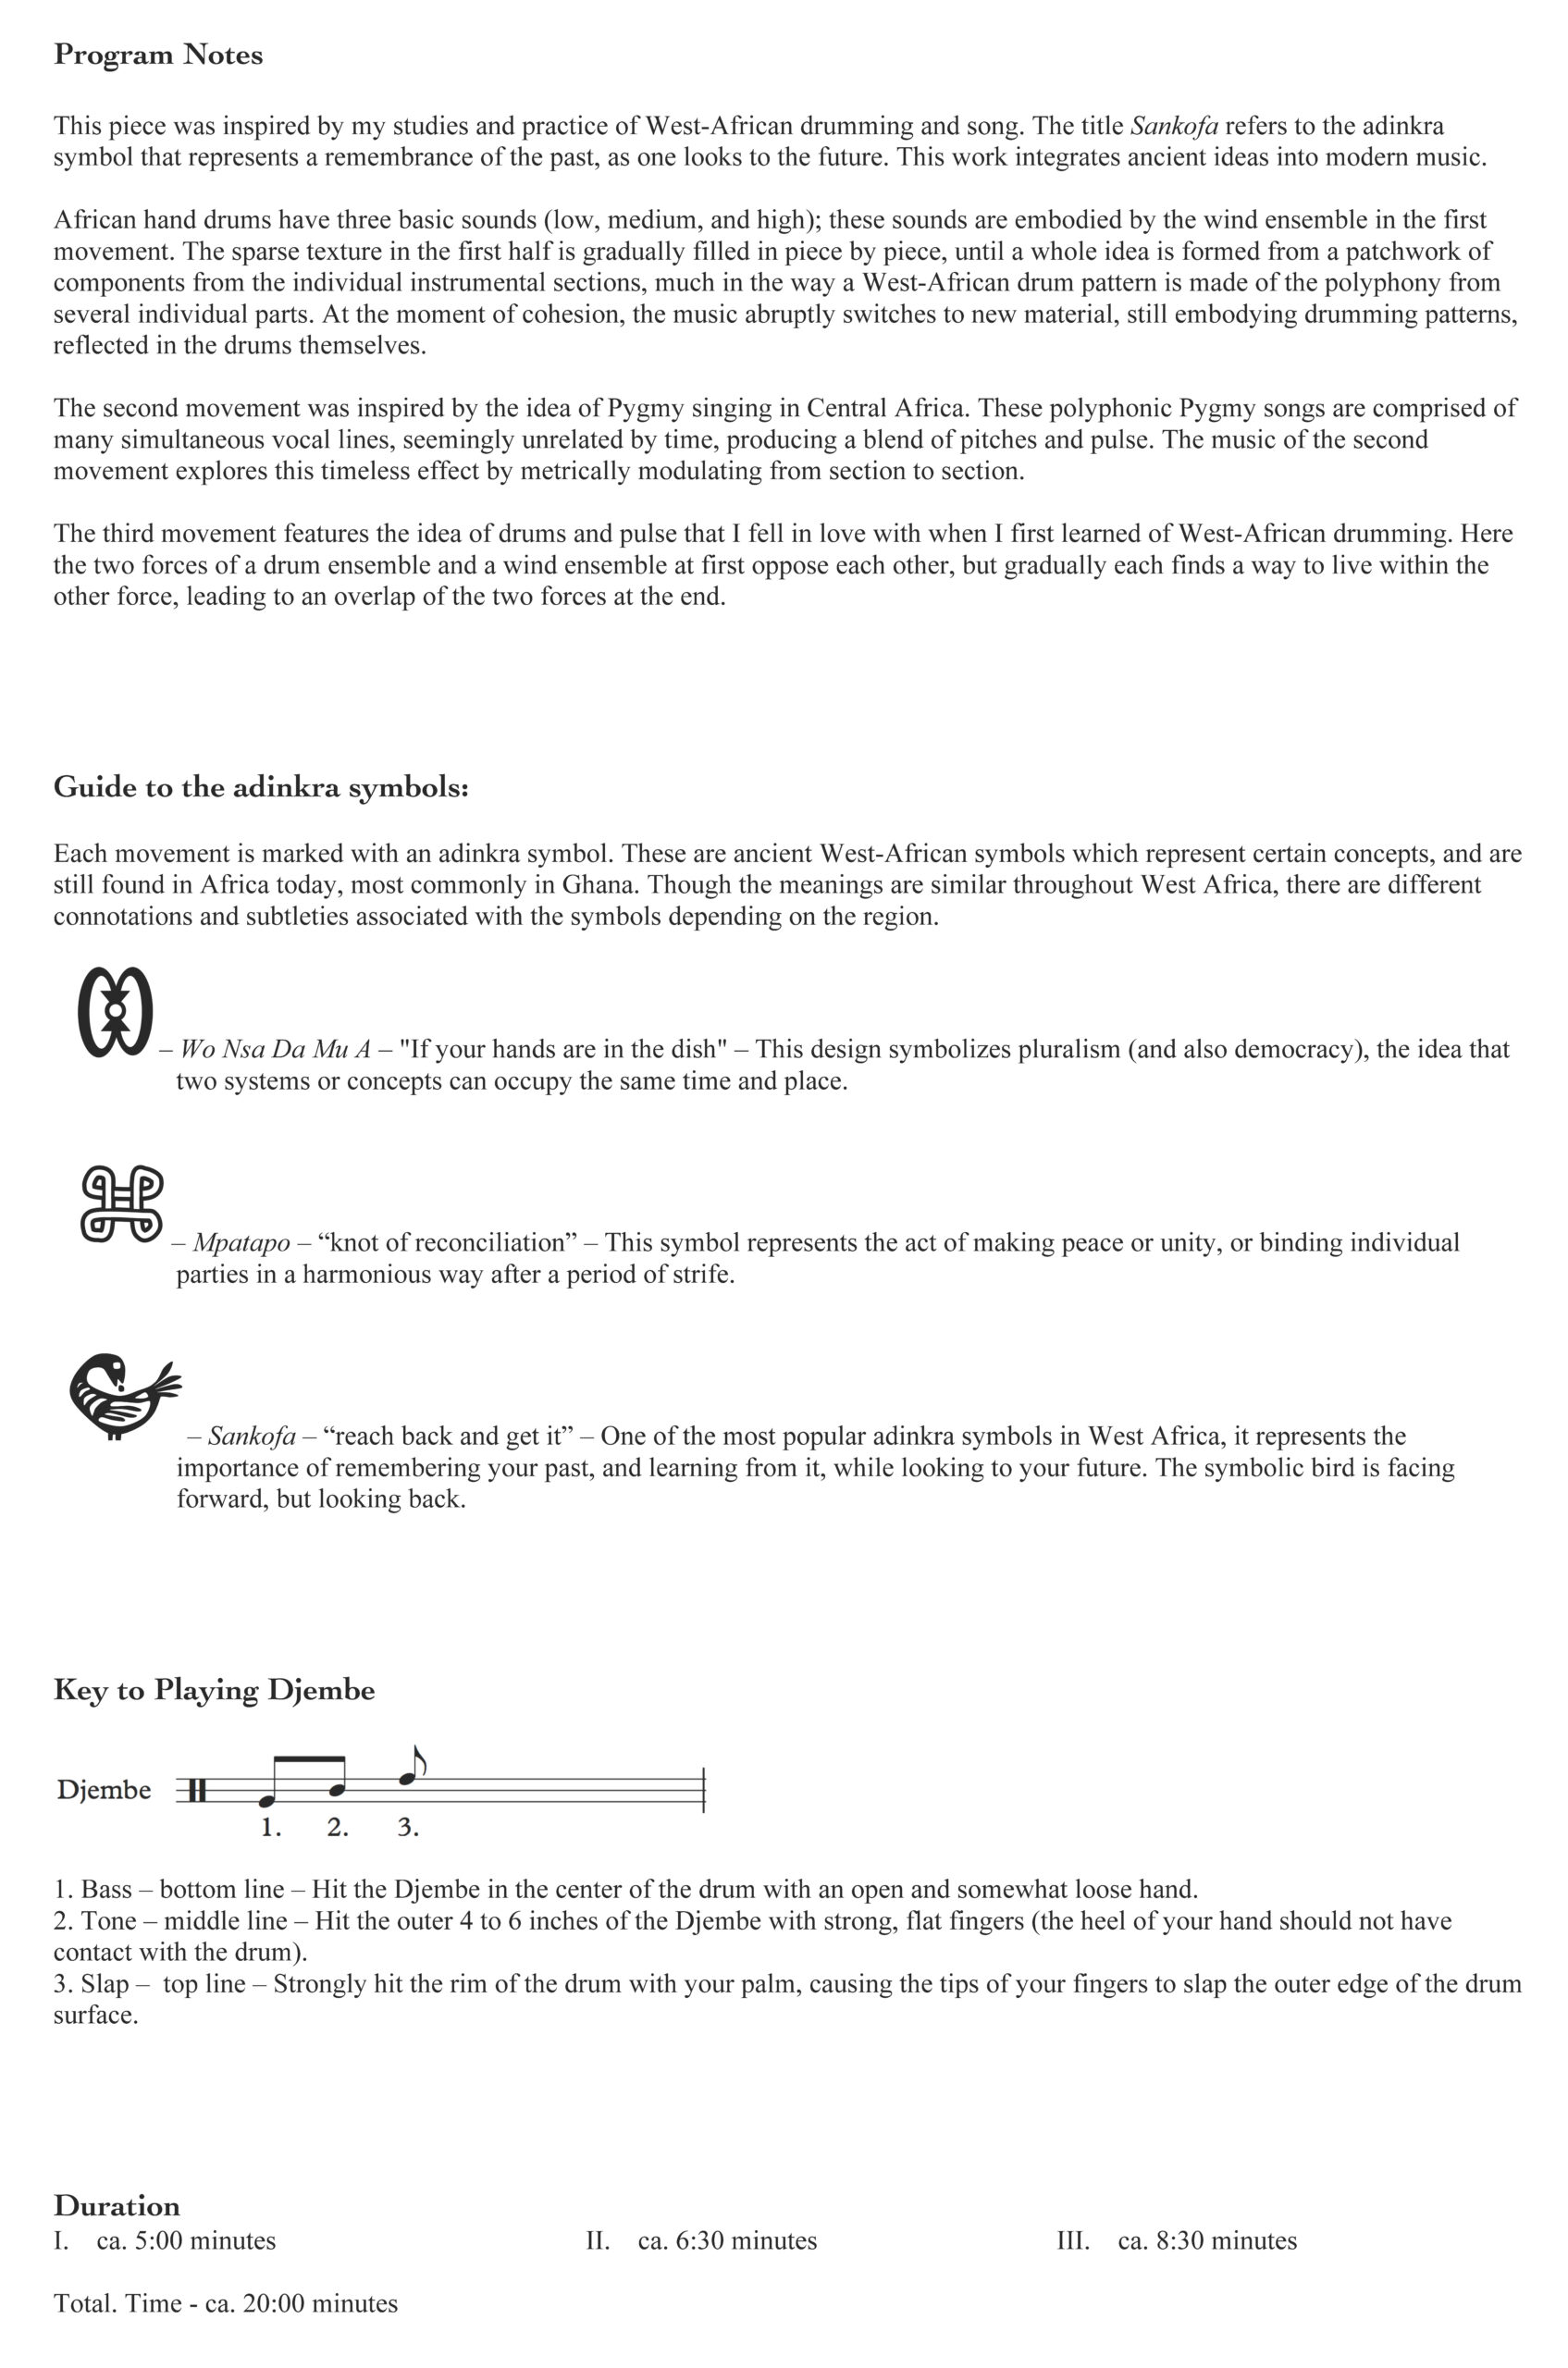 Sankofa Program Notes page 1